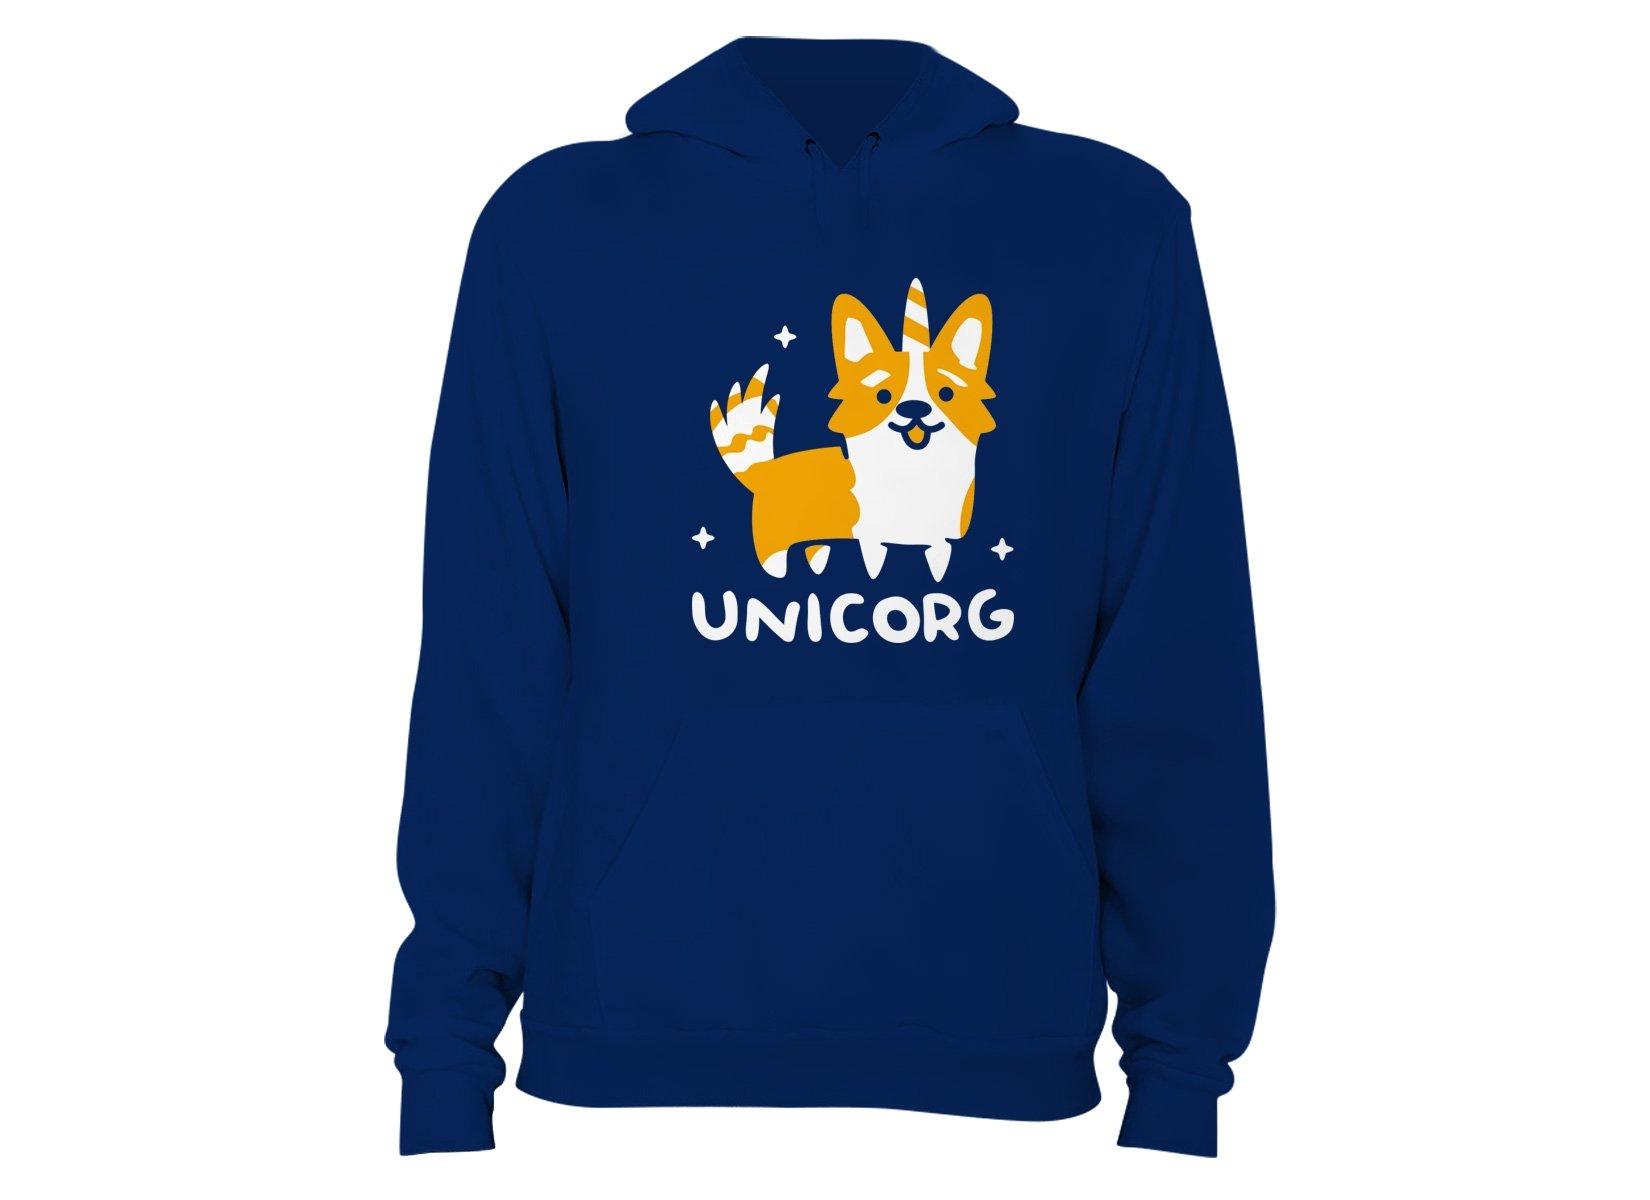 Unicorg on Hoodie